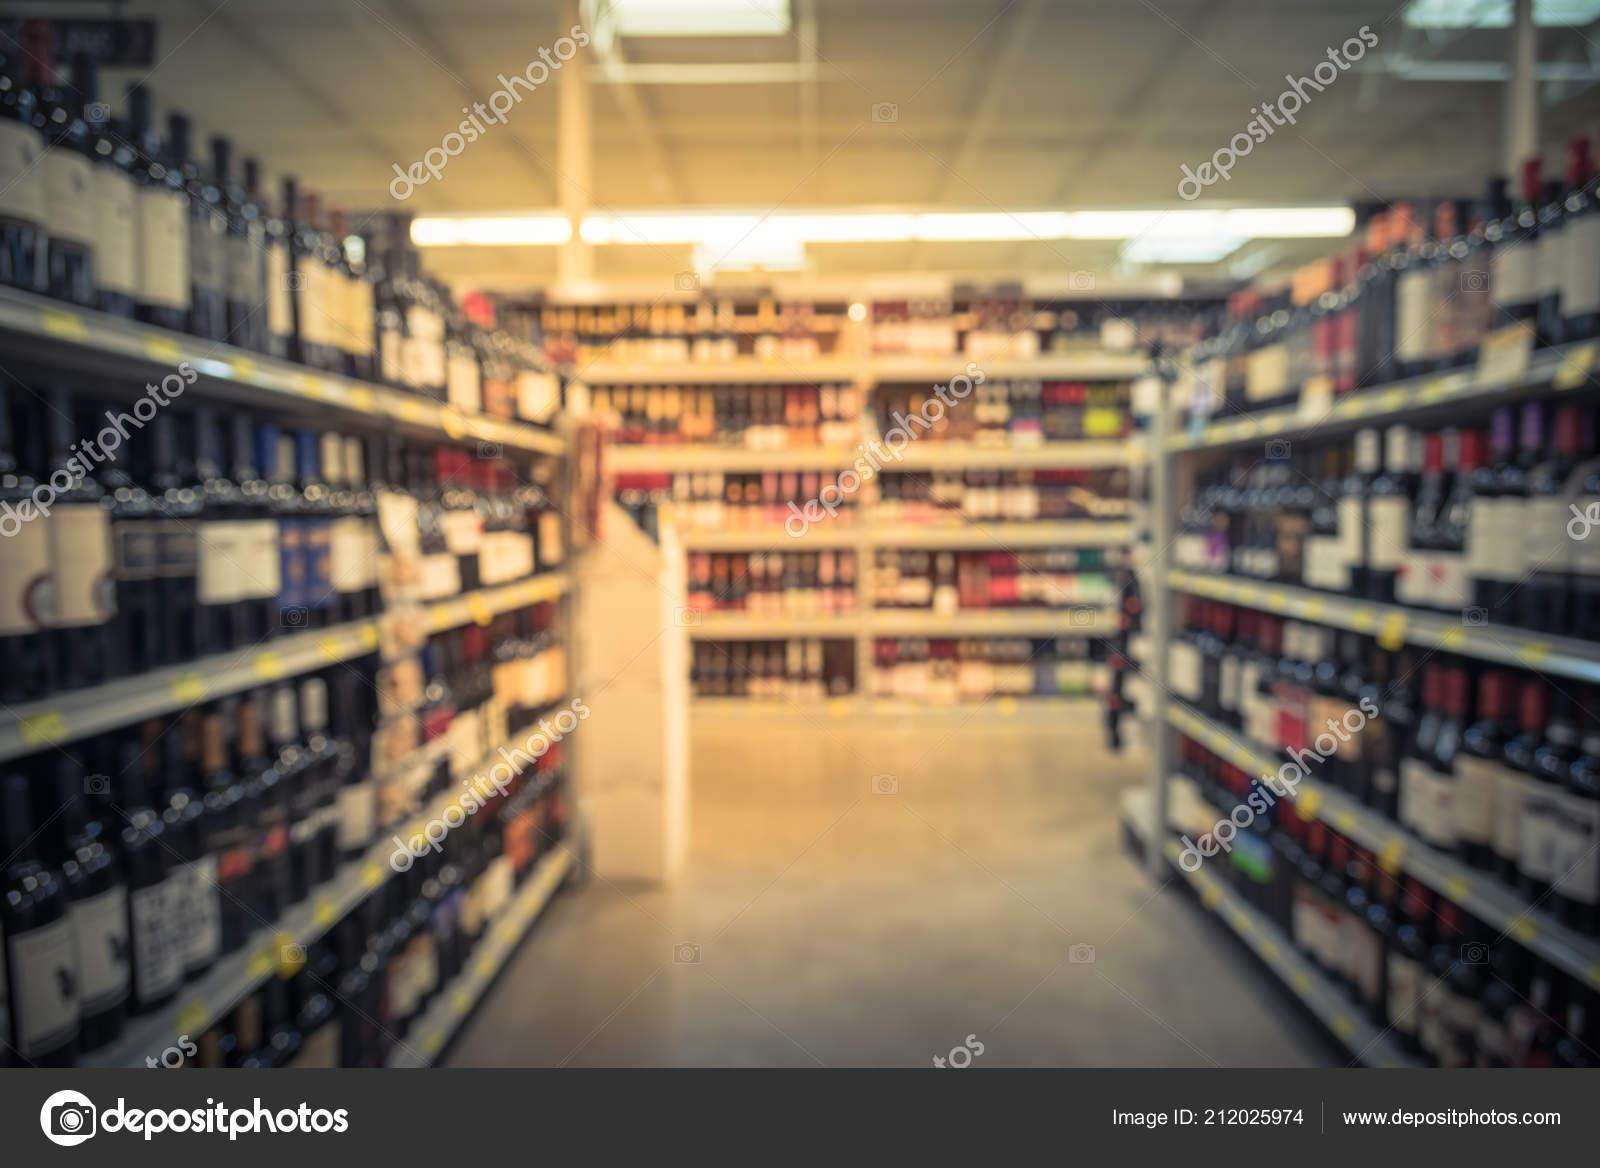 Vintage Tone Blurred Wine Shelves Price Tags Display Store